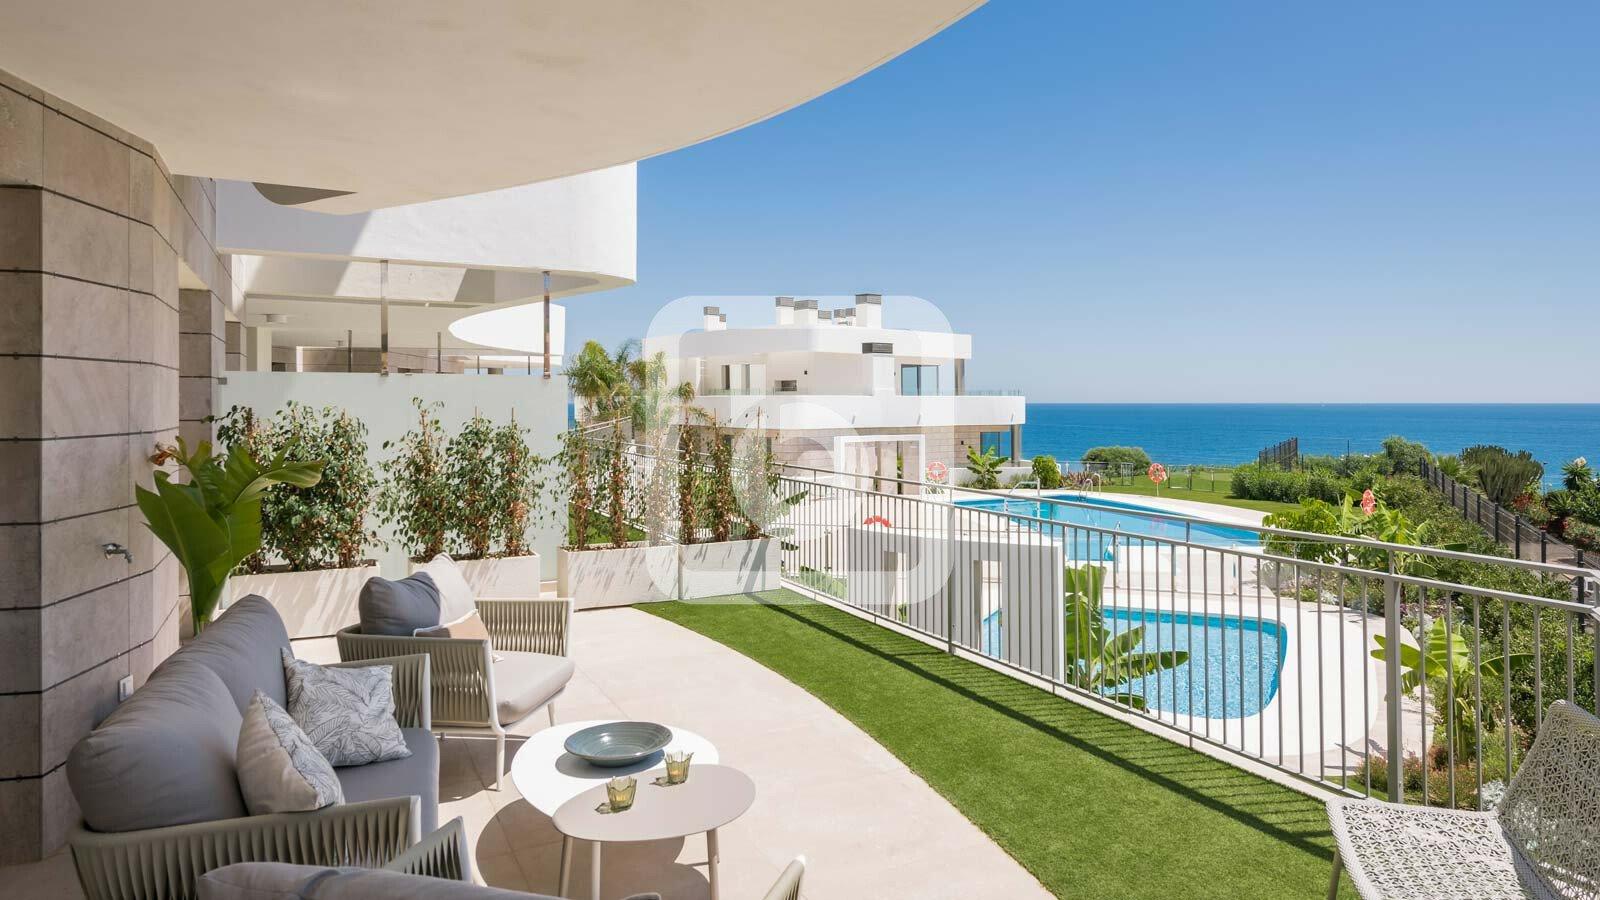 Appartamento a Mijas, Andalusia, Spagna 1 - 11439033